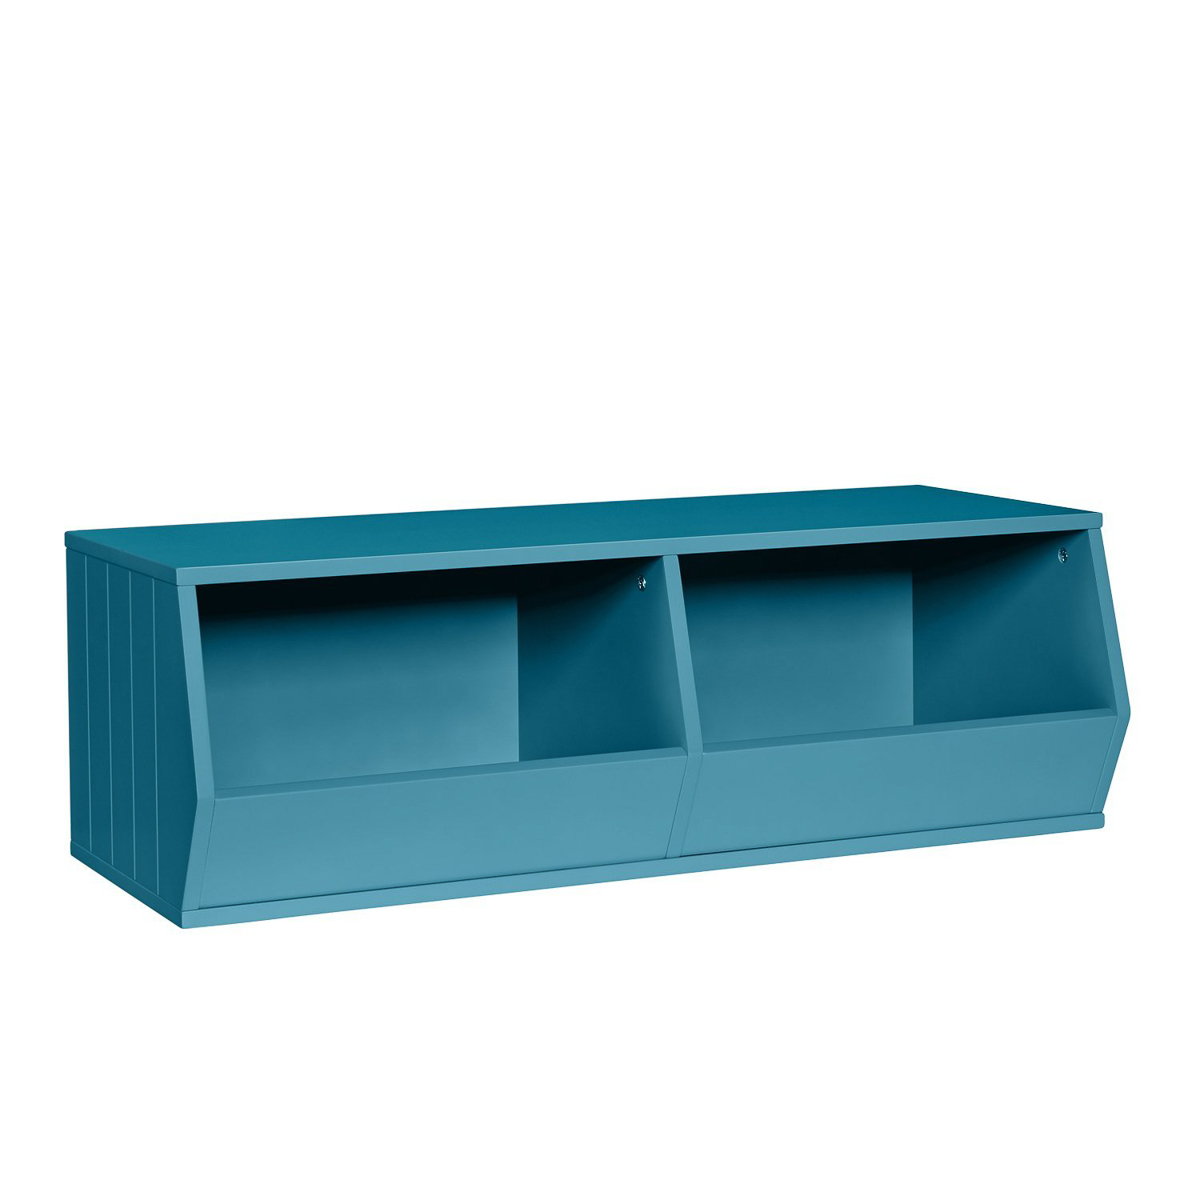 Beau Riverridge 2 Cubby Storage Bins For Stackable Storage